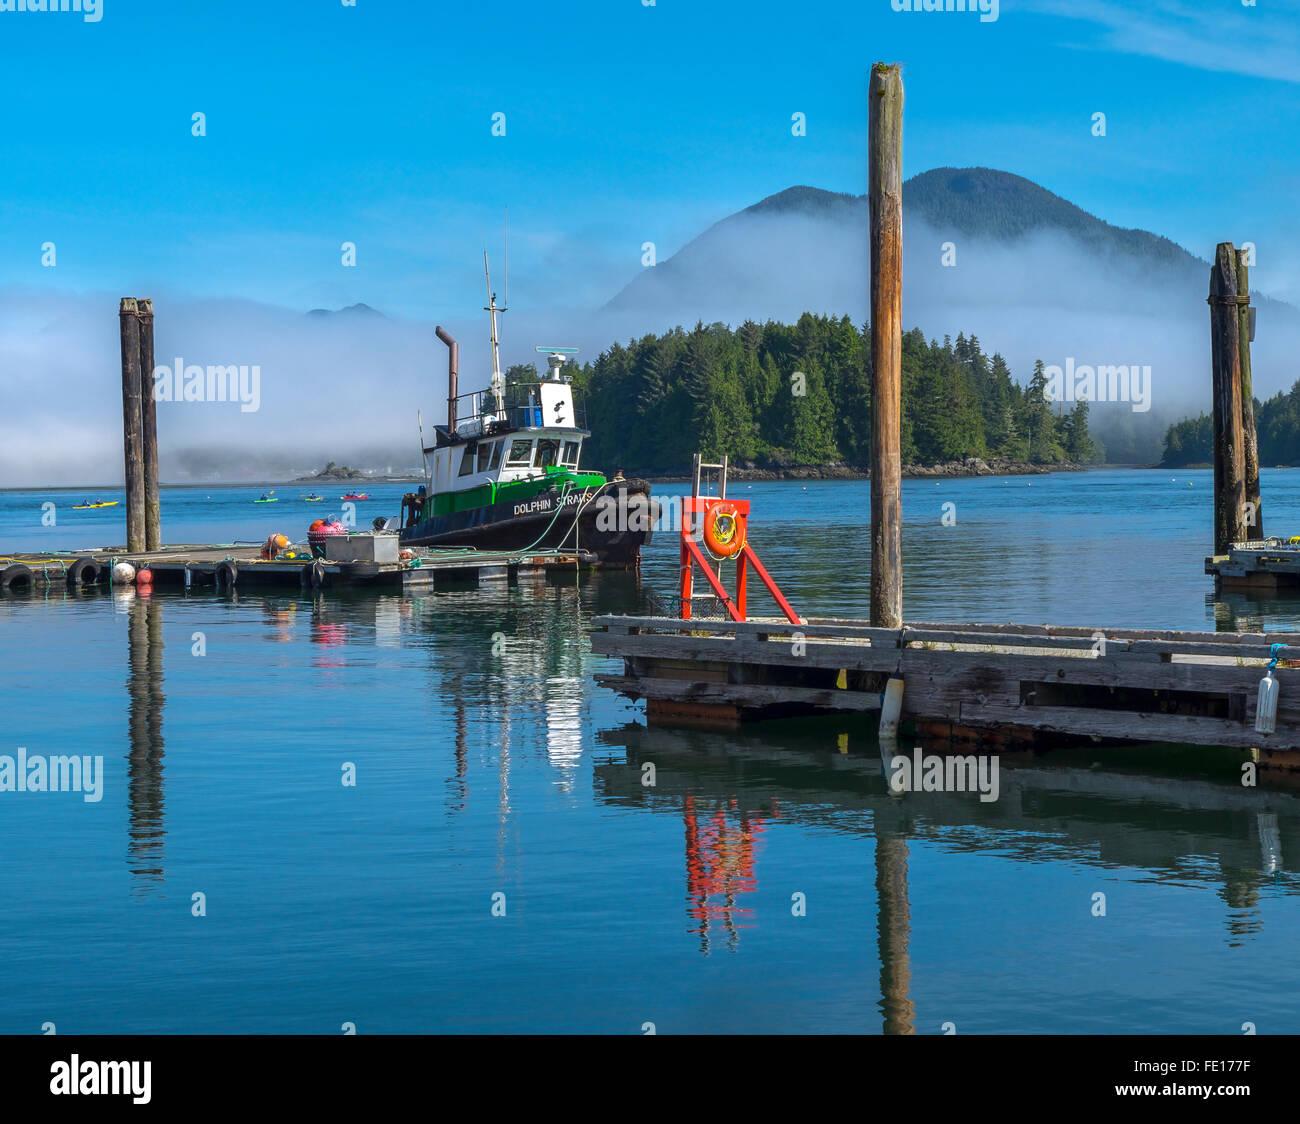 Sheds Vancouver Island